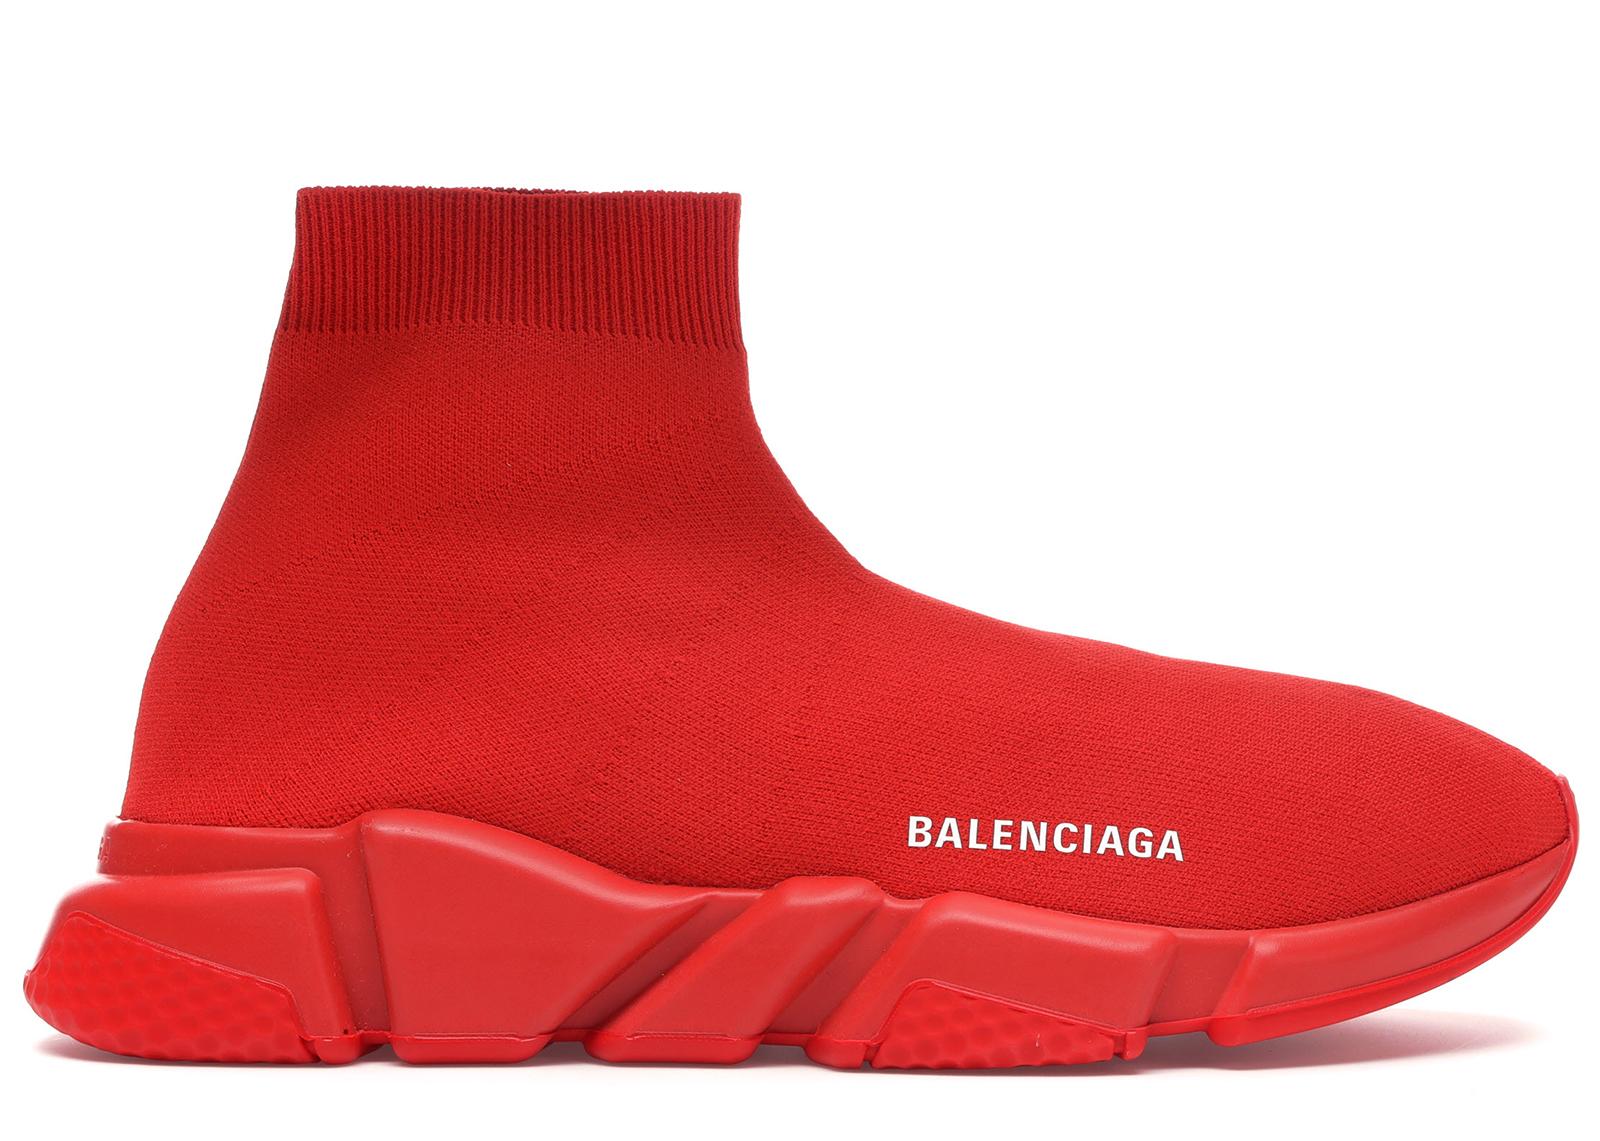 Balenciaga Speed Trainer Red - 530353